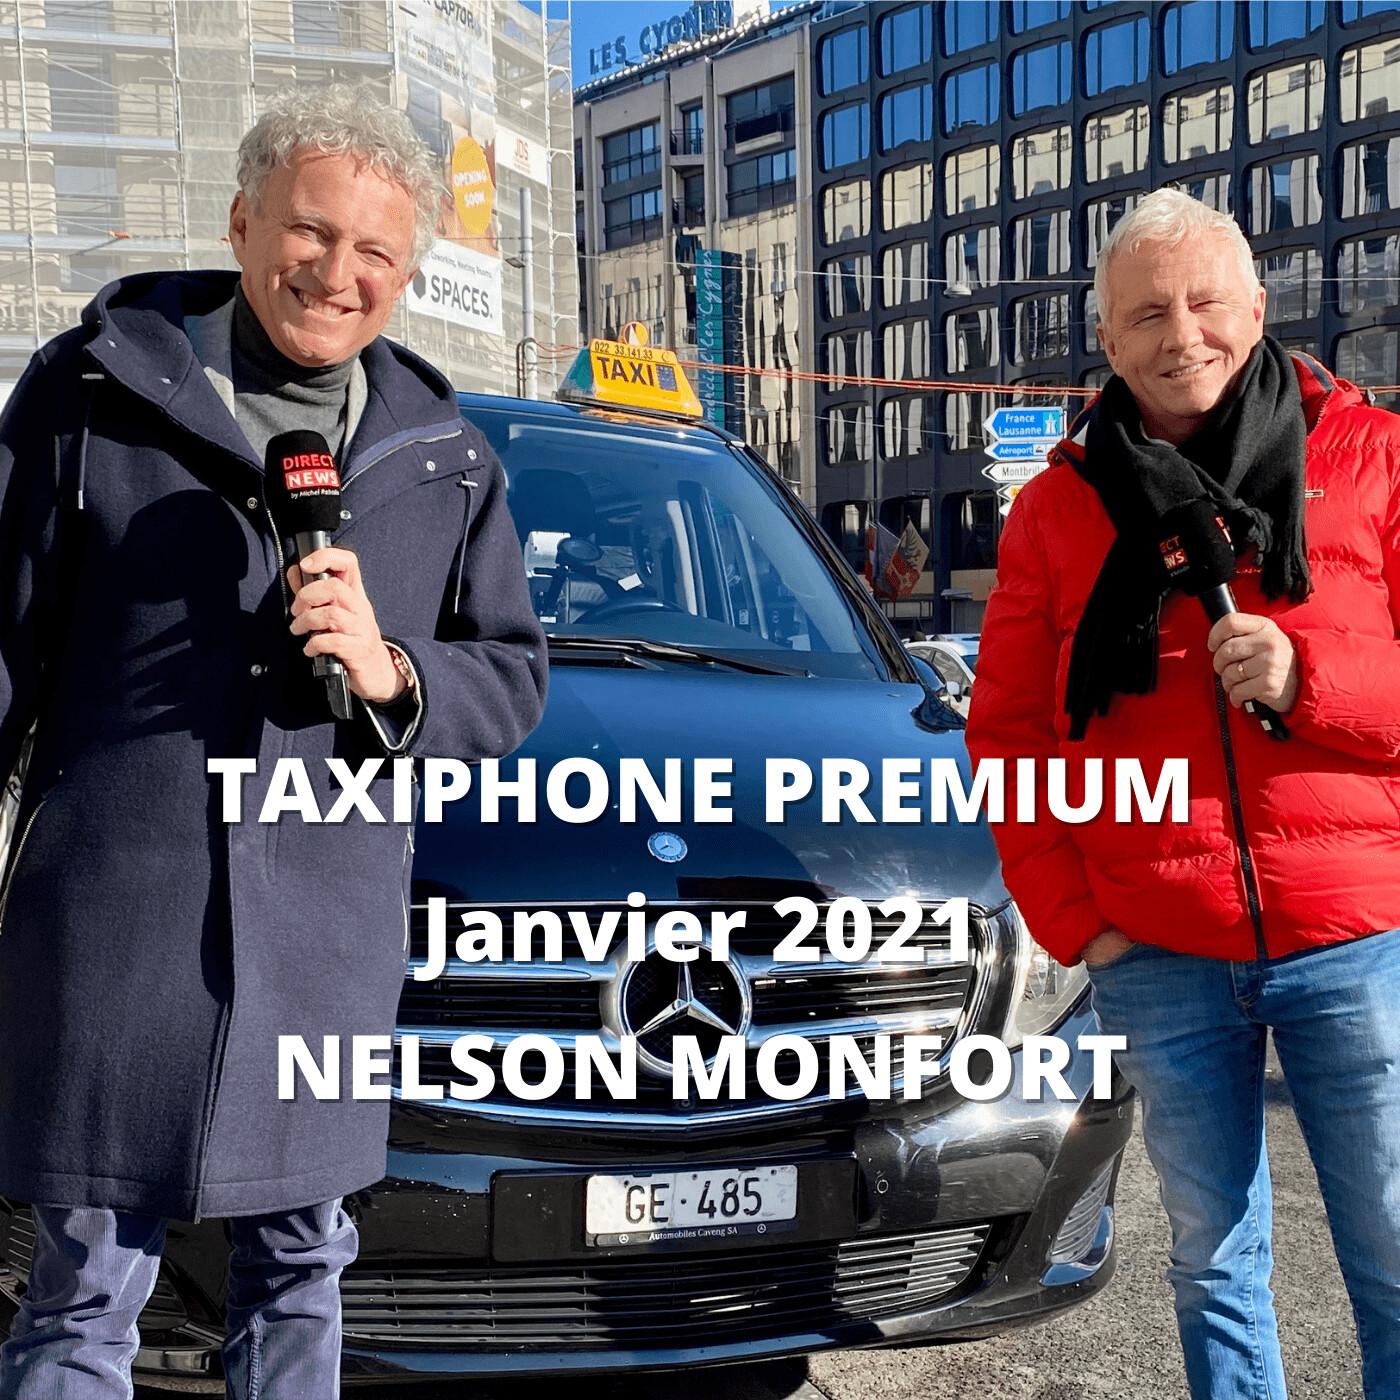 TAXIPHONE PREMIUM Janvier 2021 - Nelson Monfort